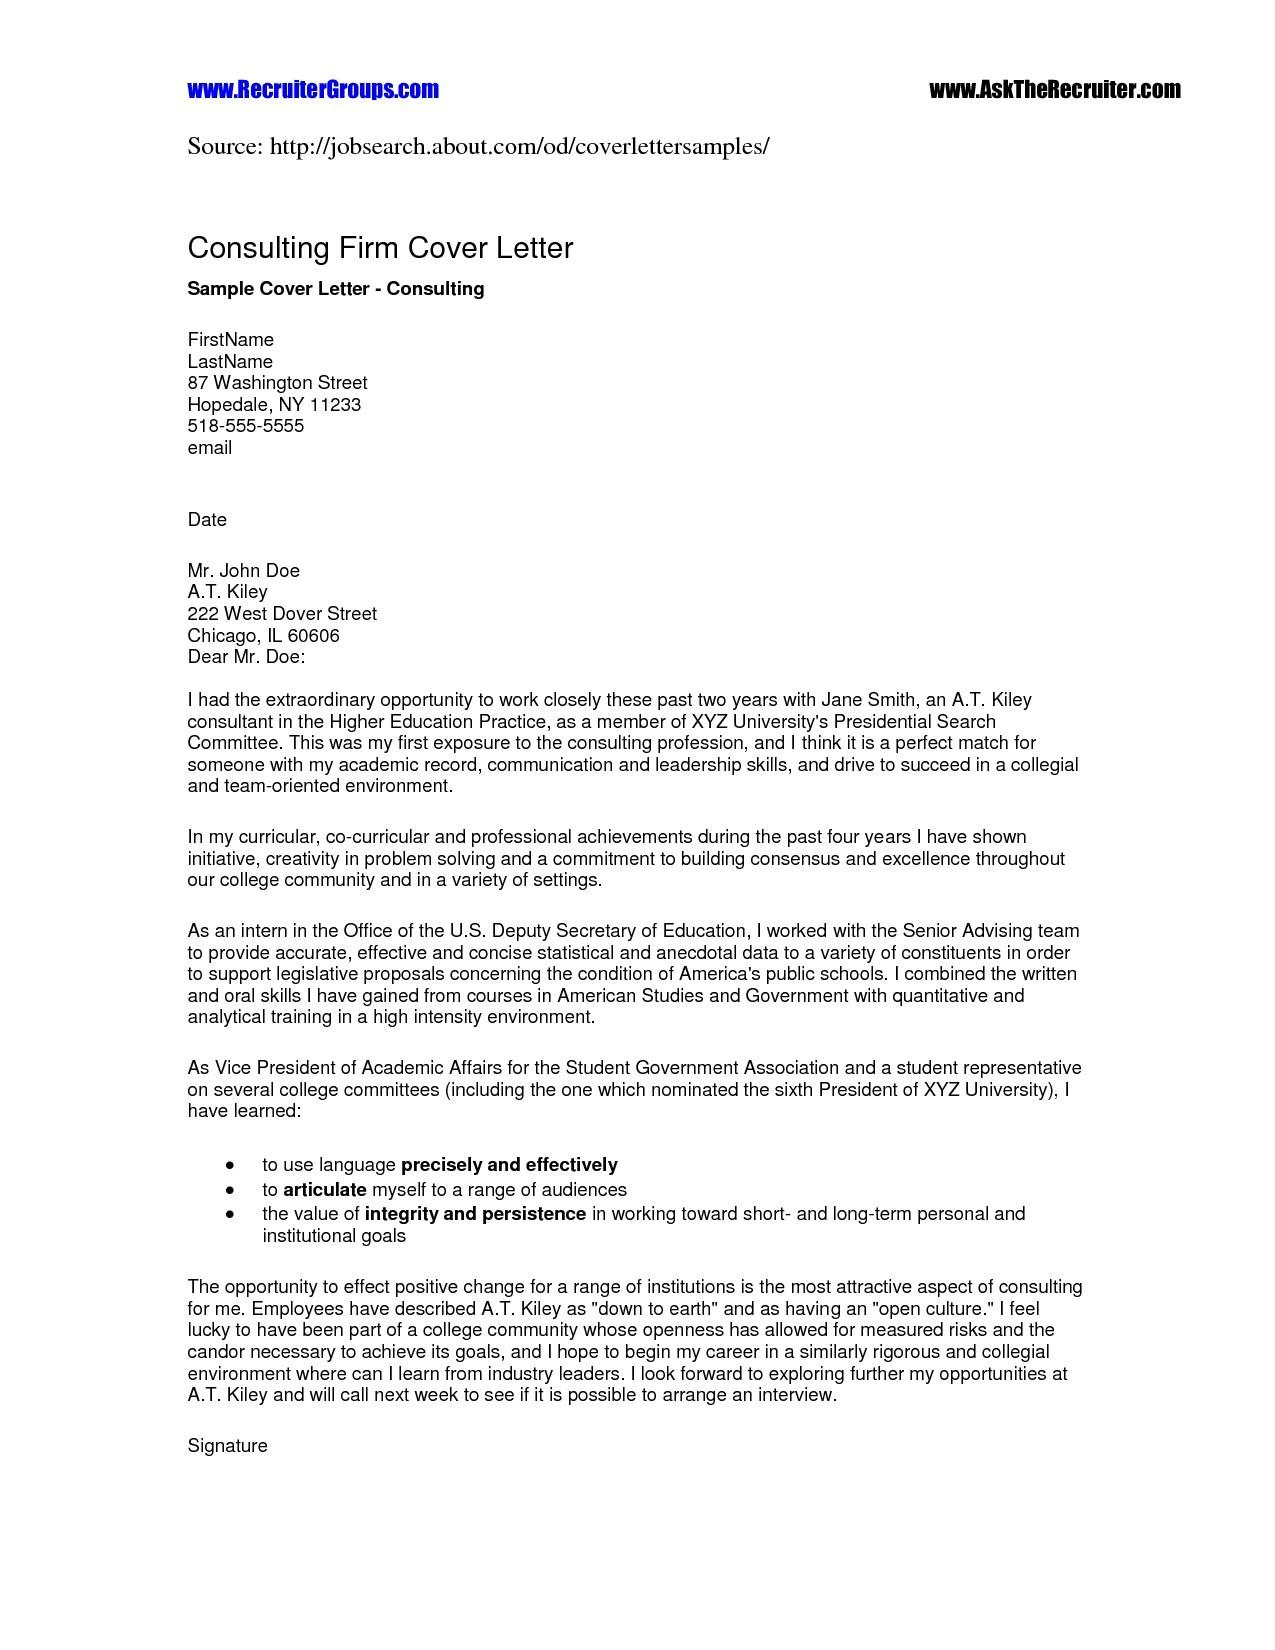 Business Valuation Engagement Letter Template - Engagement Letter Template Uk Best Undertaking Letter format